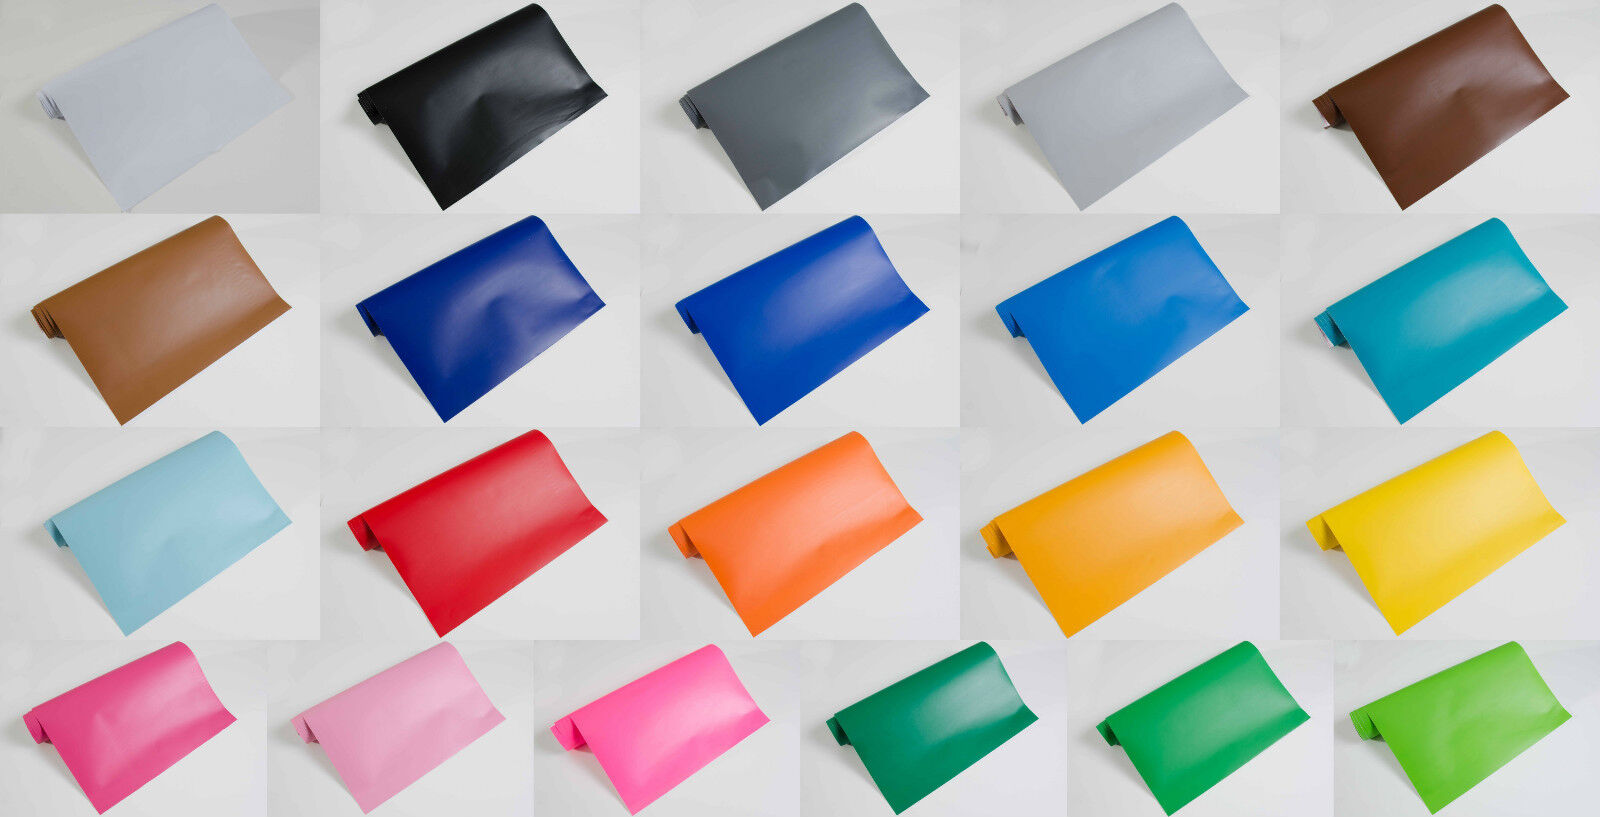 plotterfolie deko matt 3 20 m klebefolie m bel selbstklebend plotter folie ebay. Black Bedroom Furniture Sets. Home Design Ideas